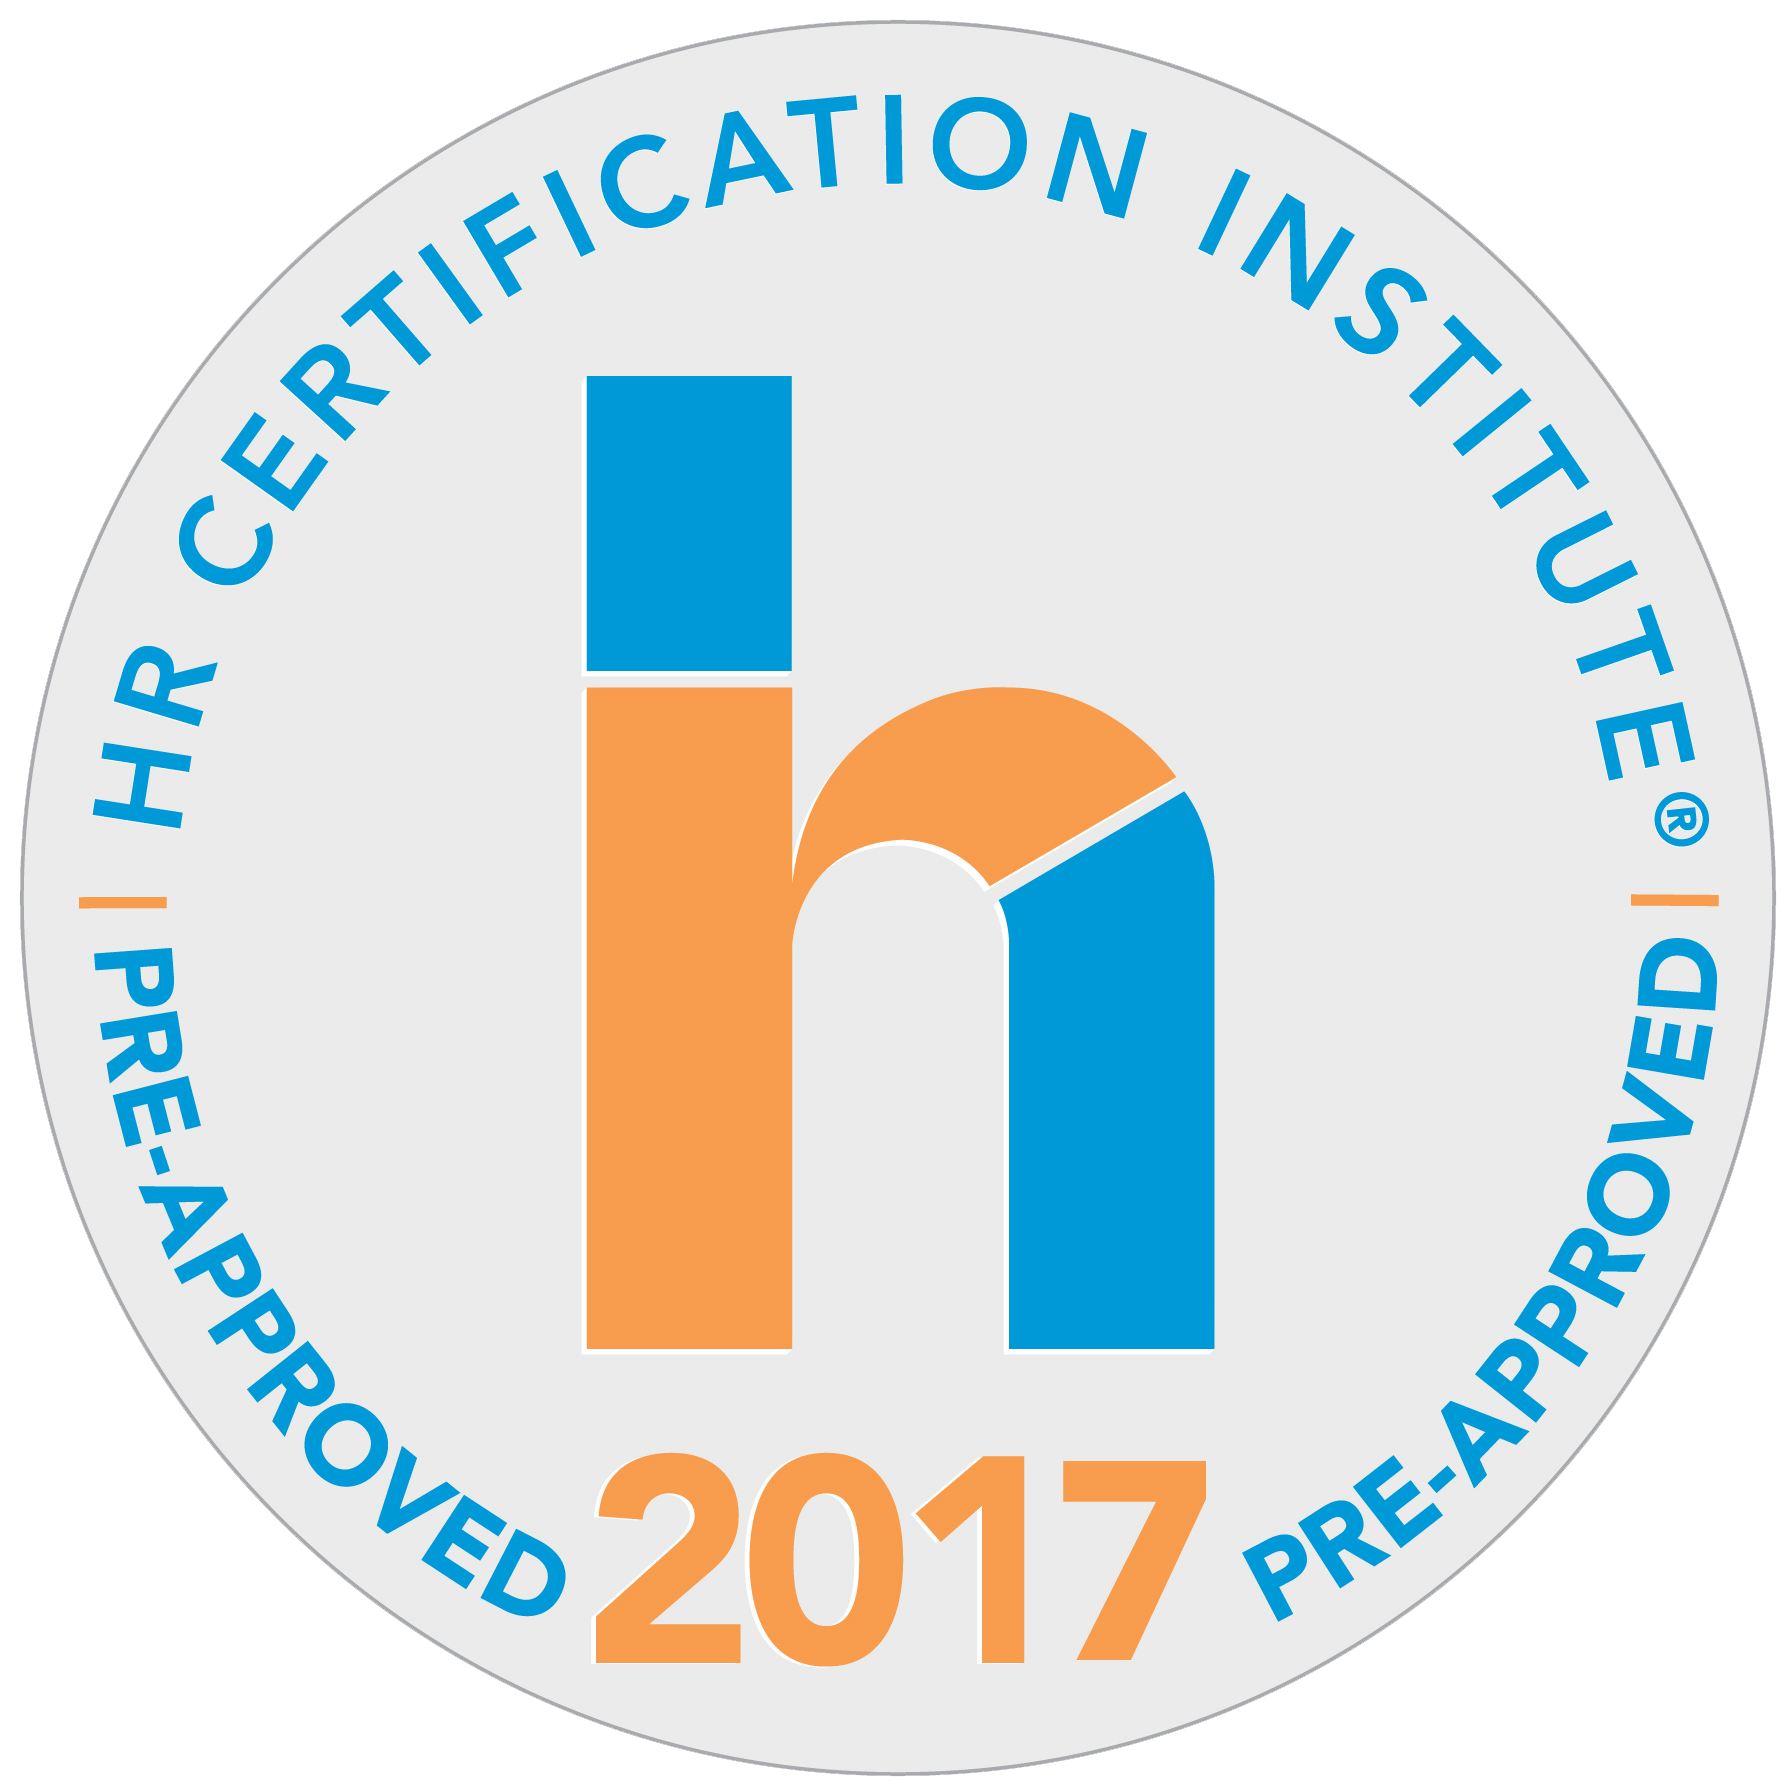 Asombroso Phr Certification Chicago Coleccin Para La Aplicacin